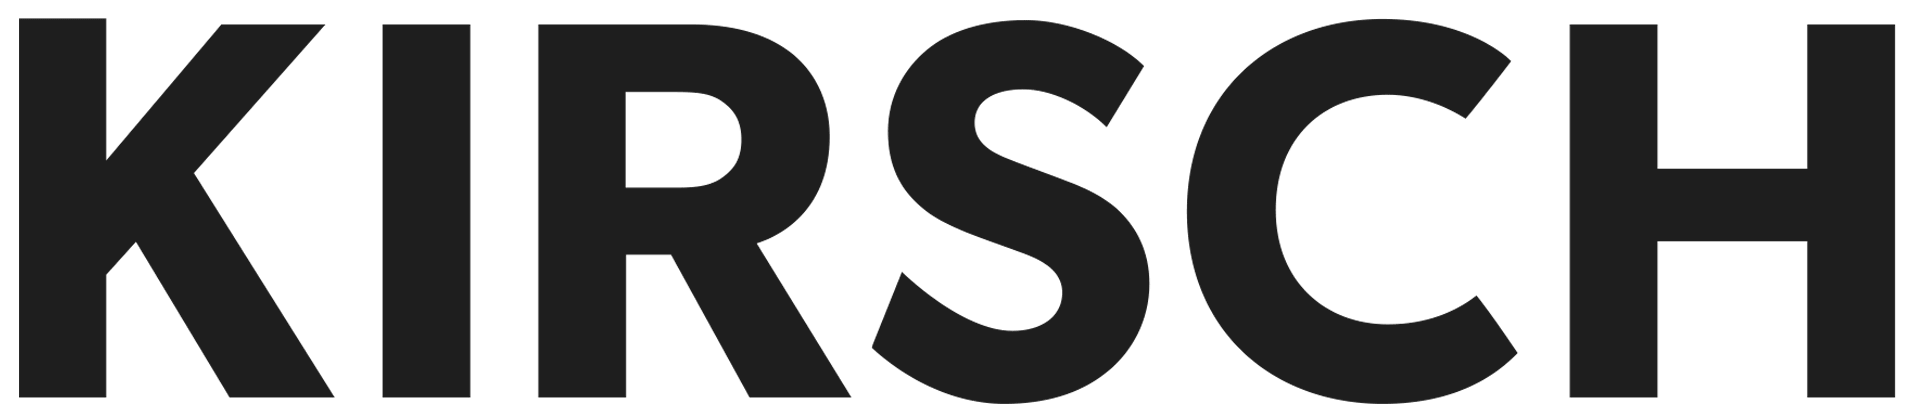 Werbeagentur Wiesbaden